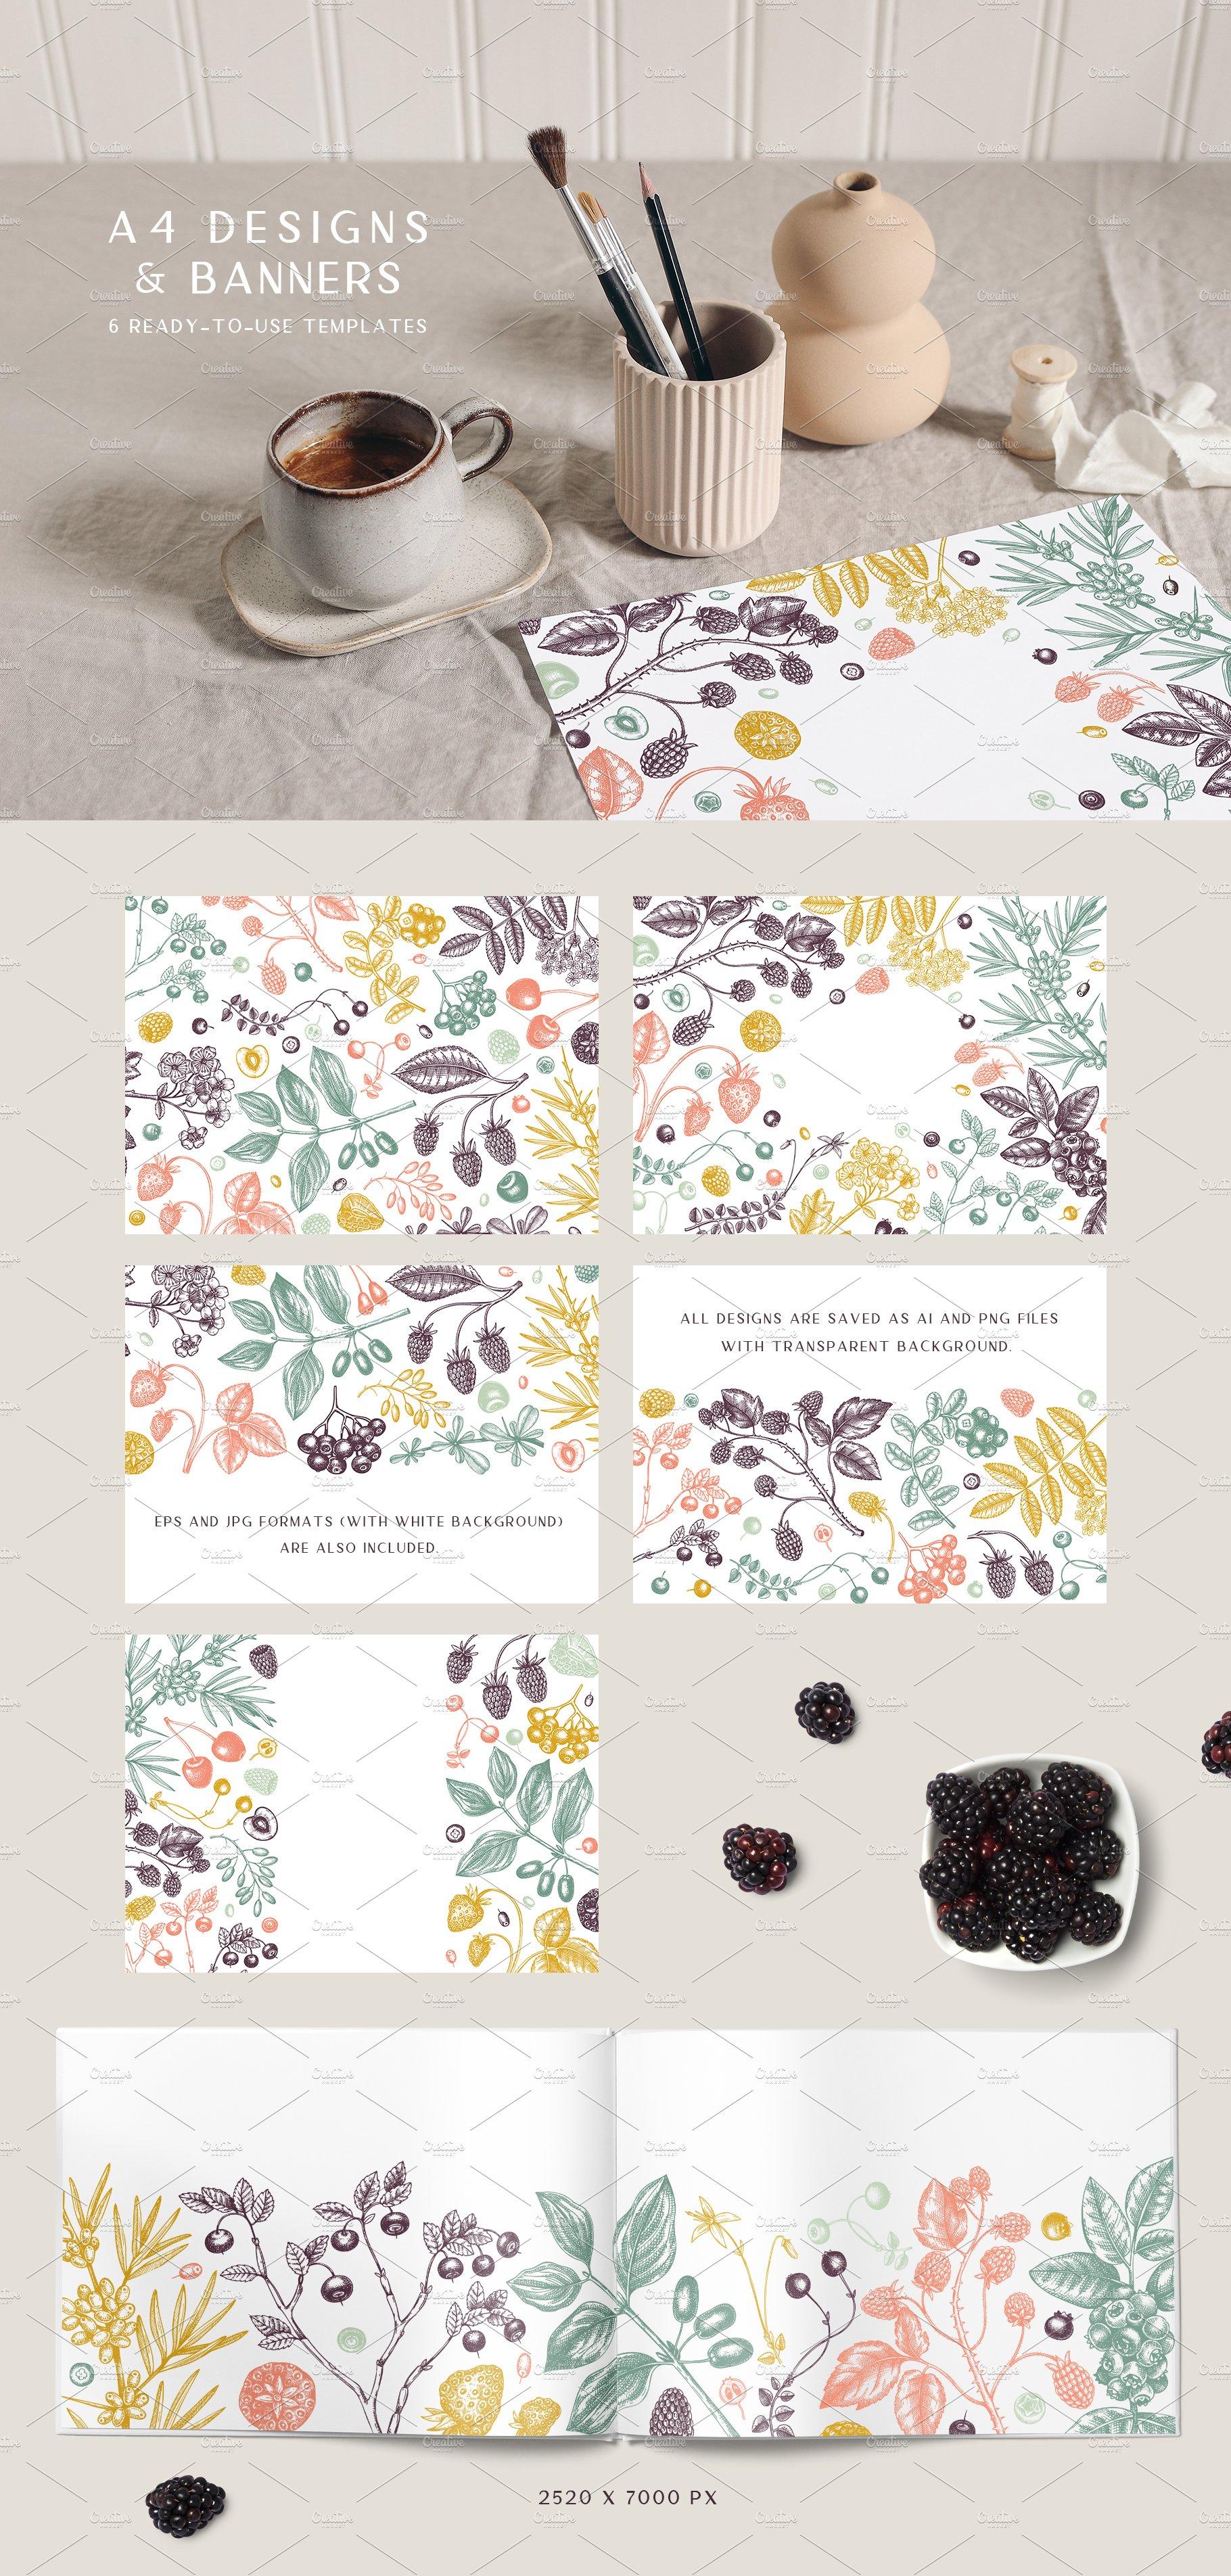 hand drawn berries vectors and designs 08 6